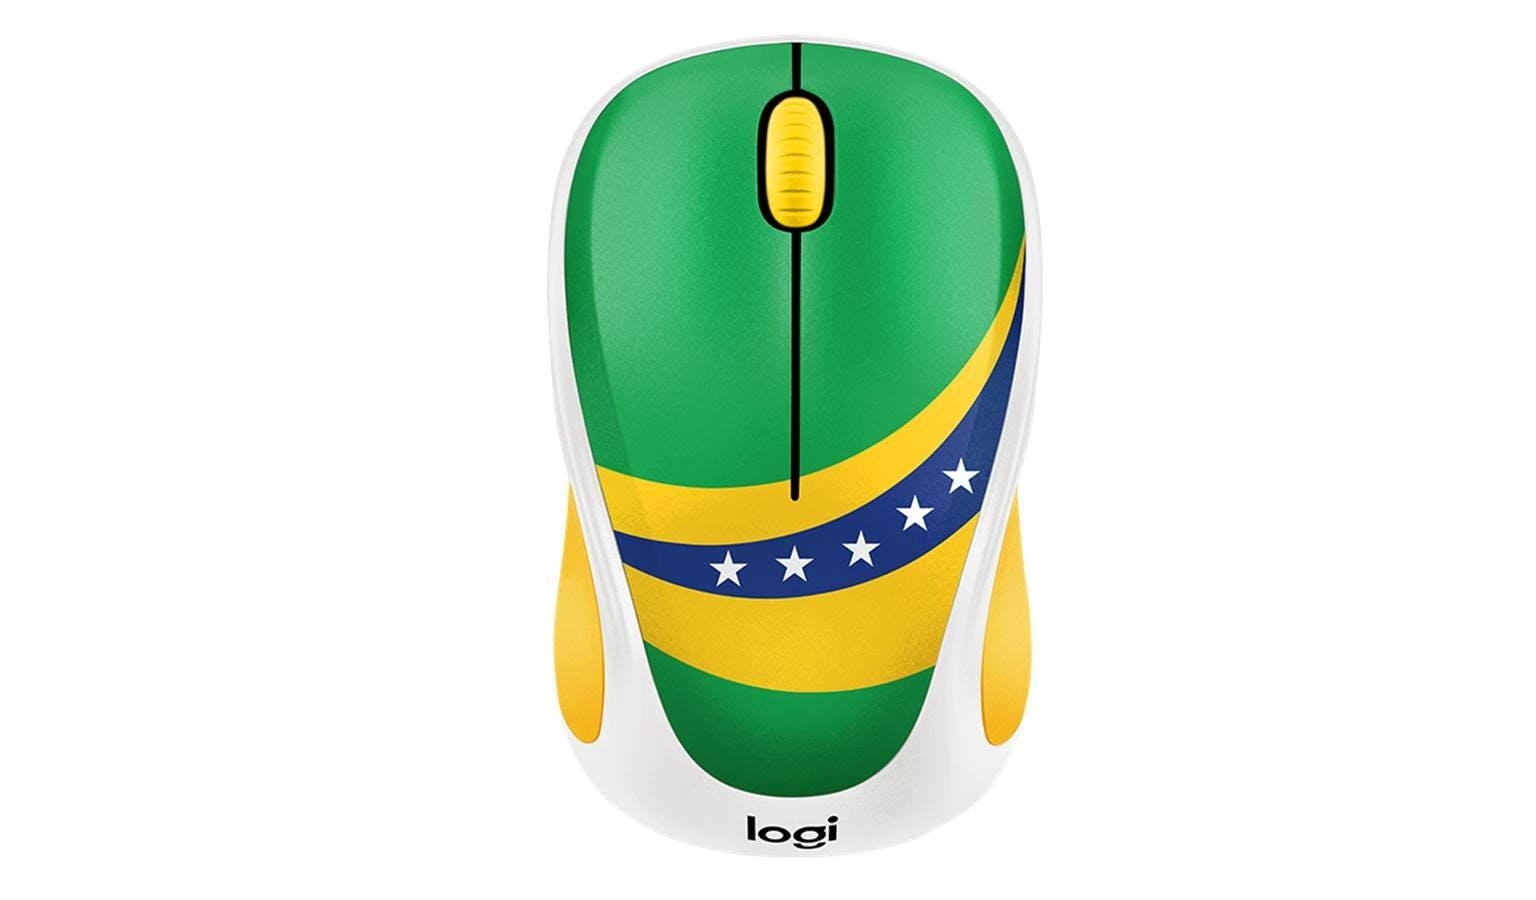 d6add89388b Logitech M238 World Cup Themed Wireless Mouse - Brazil 910-005406 | Harvey  Norman Singapore